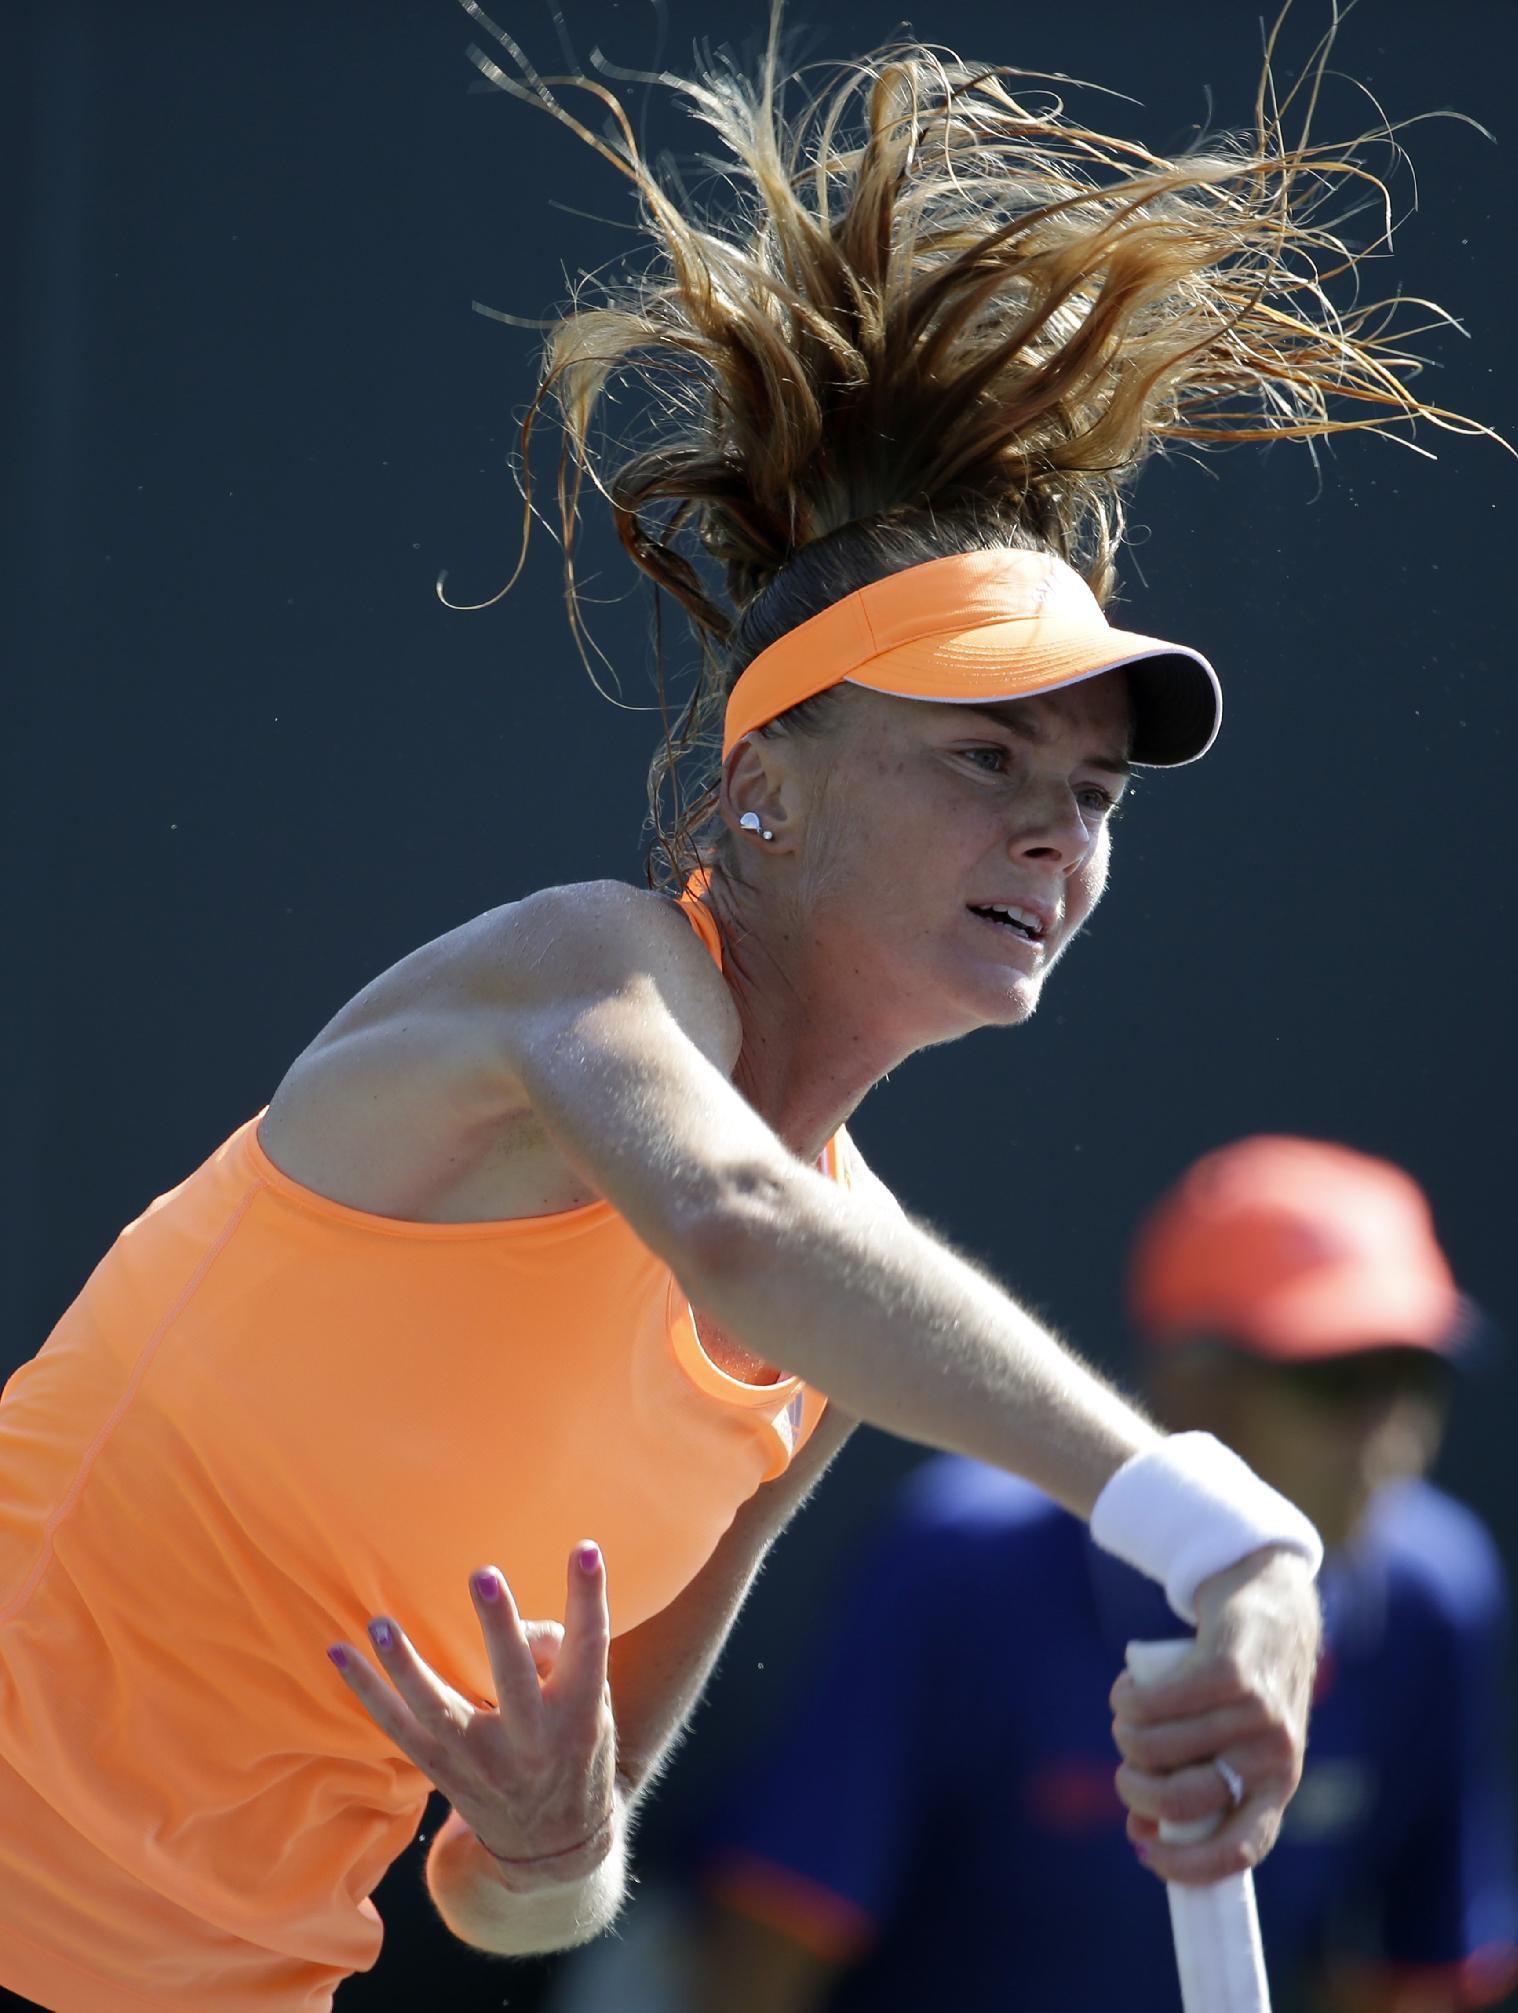 Daniela Hantuchova, of Slovakia, serves to Madison Keys at the Sony Open tennis tournament, Friday, March 21, 2014, in Key Biscayne, Fla. Keys won the match 6-4, 6-2